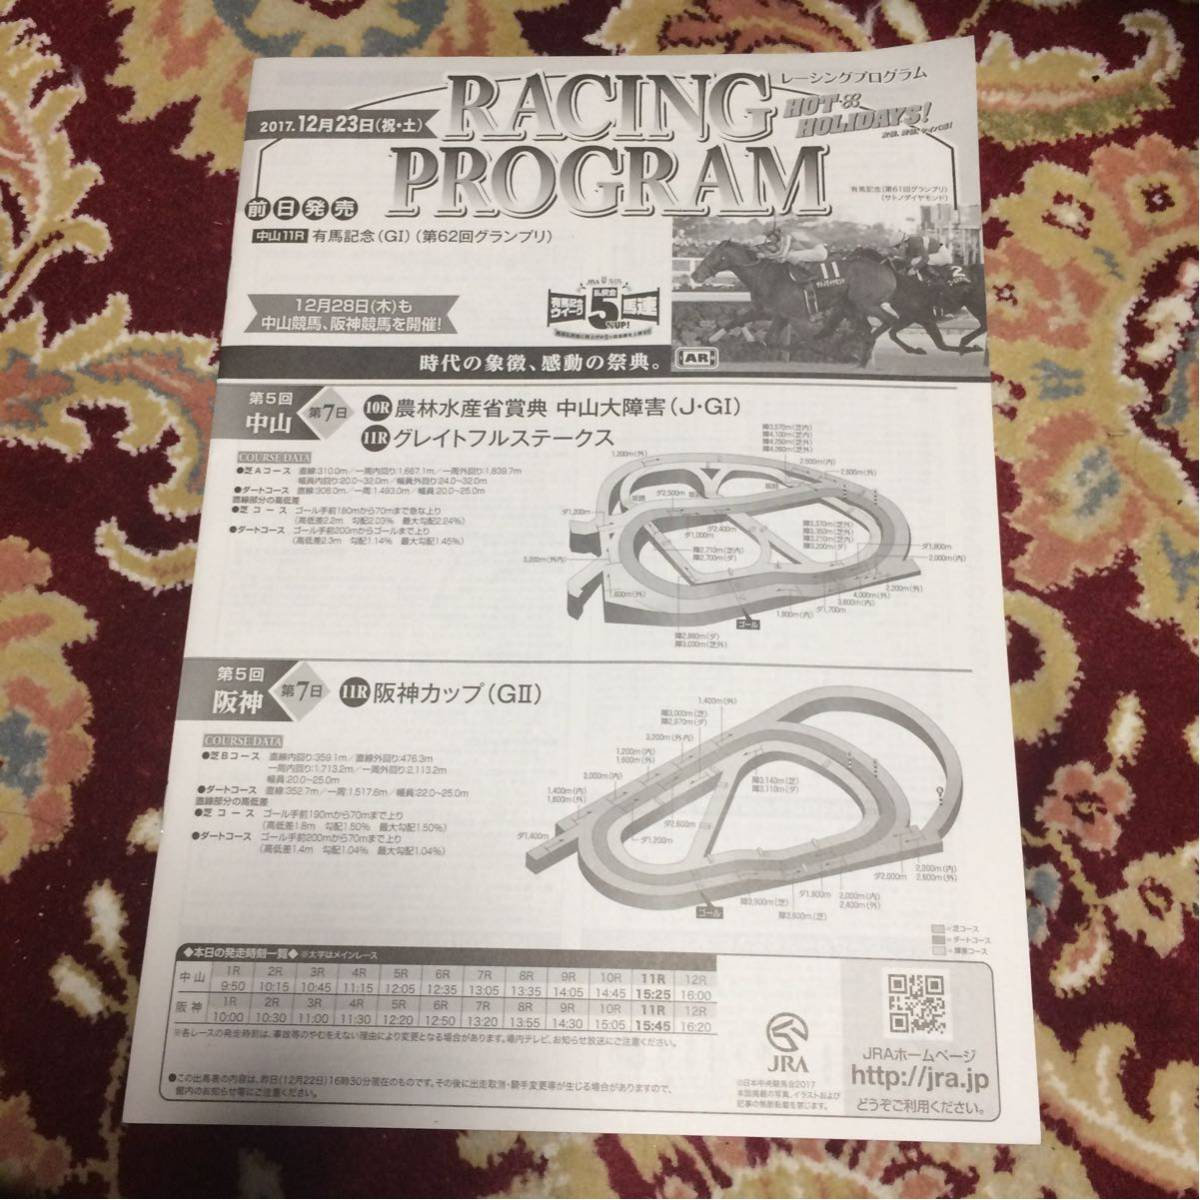 JRAレーシングプログラム2017.12月23日(祝・土)中山大障害(J・GⅠ)、グレイトフルステークス、阪神カップ(GⅡ)_画像1